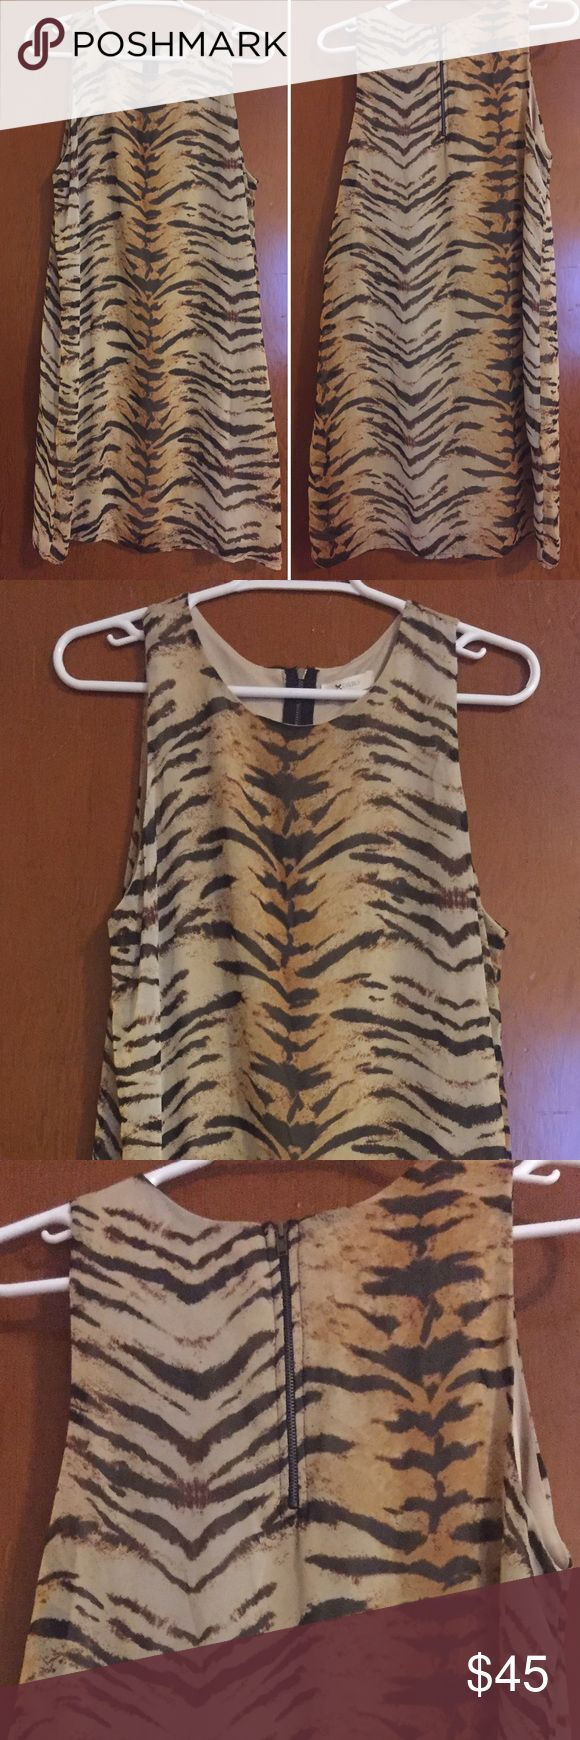 Animal print mini dress. EVERLY animal print mini dress.  Never worn. Everly Dresses Mini